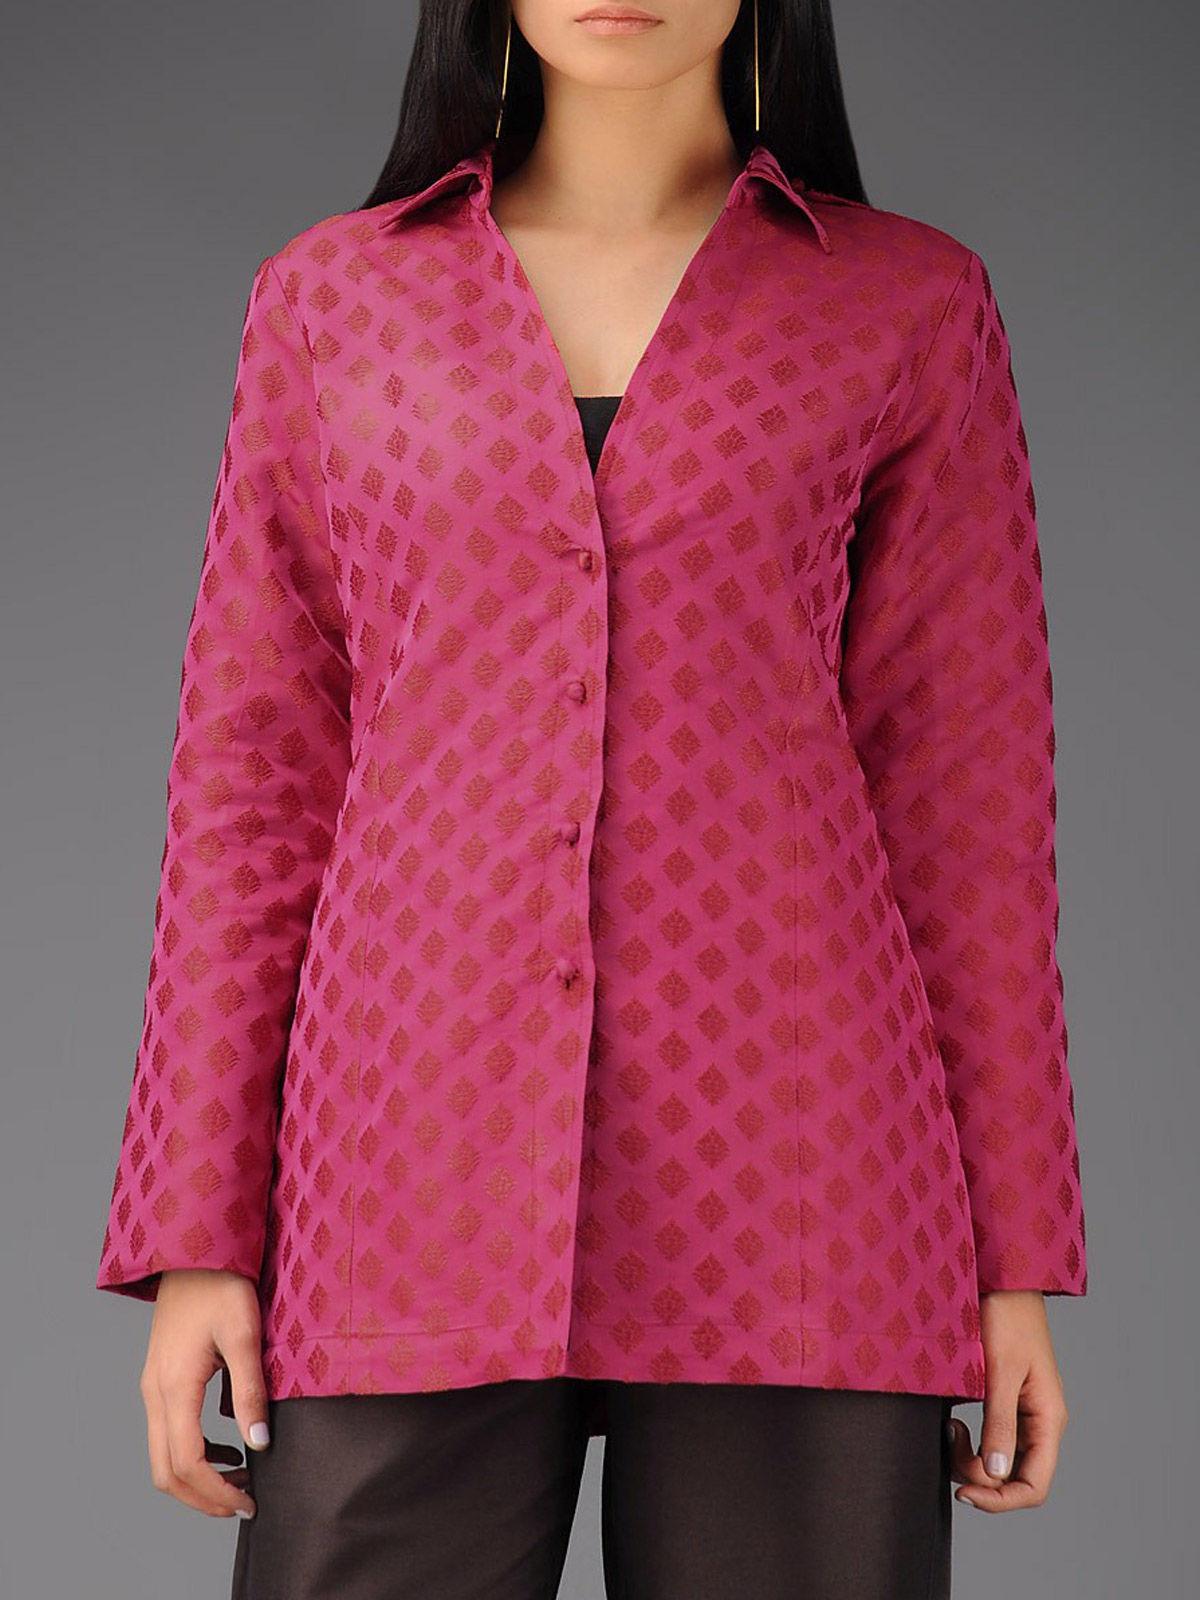 Rink silk tanchoi jacket